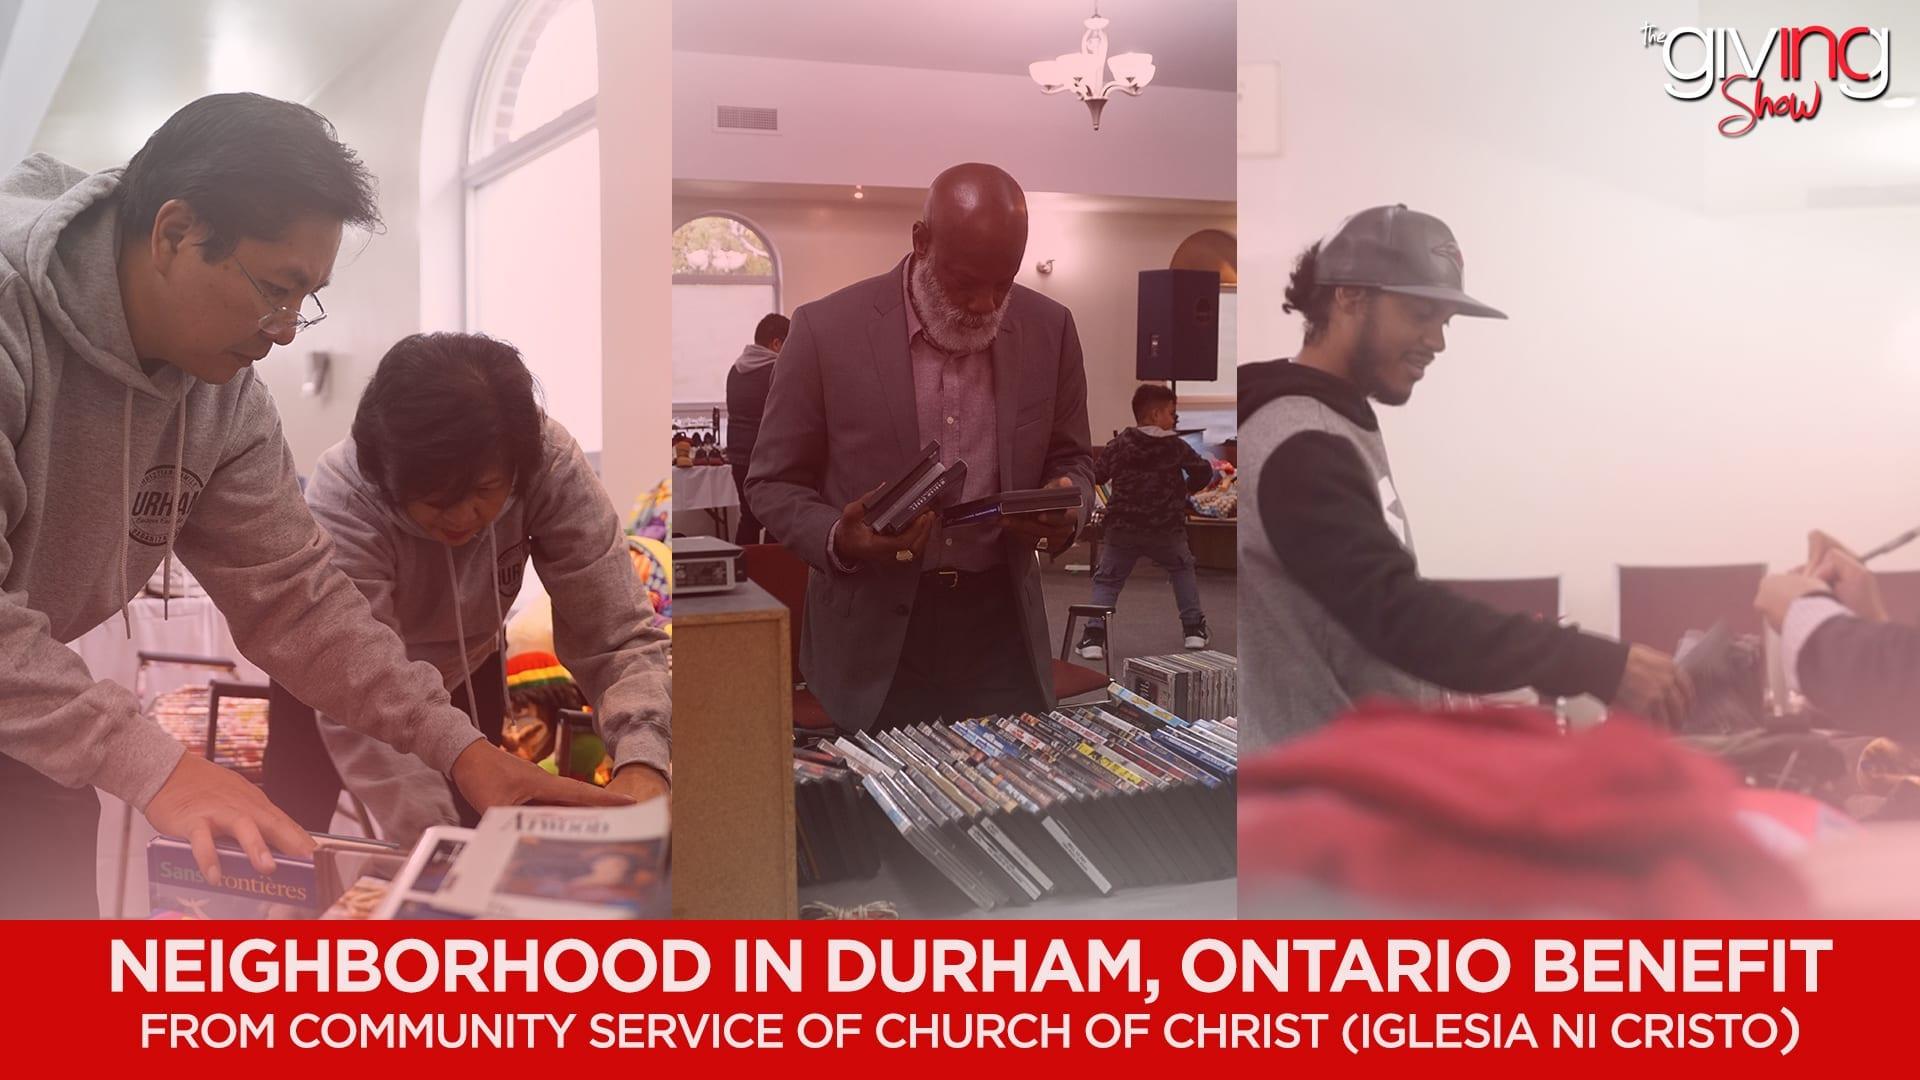 Neighborhood in Durham, Ontario Benefit from Community Service of Church Of Christ (Iglesia Ni Cristo)